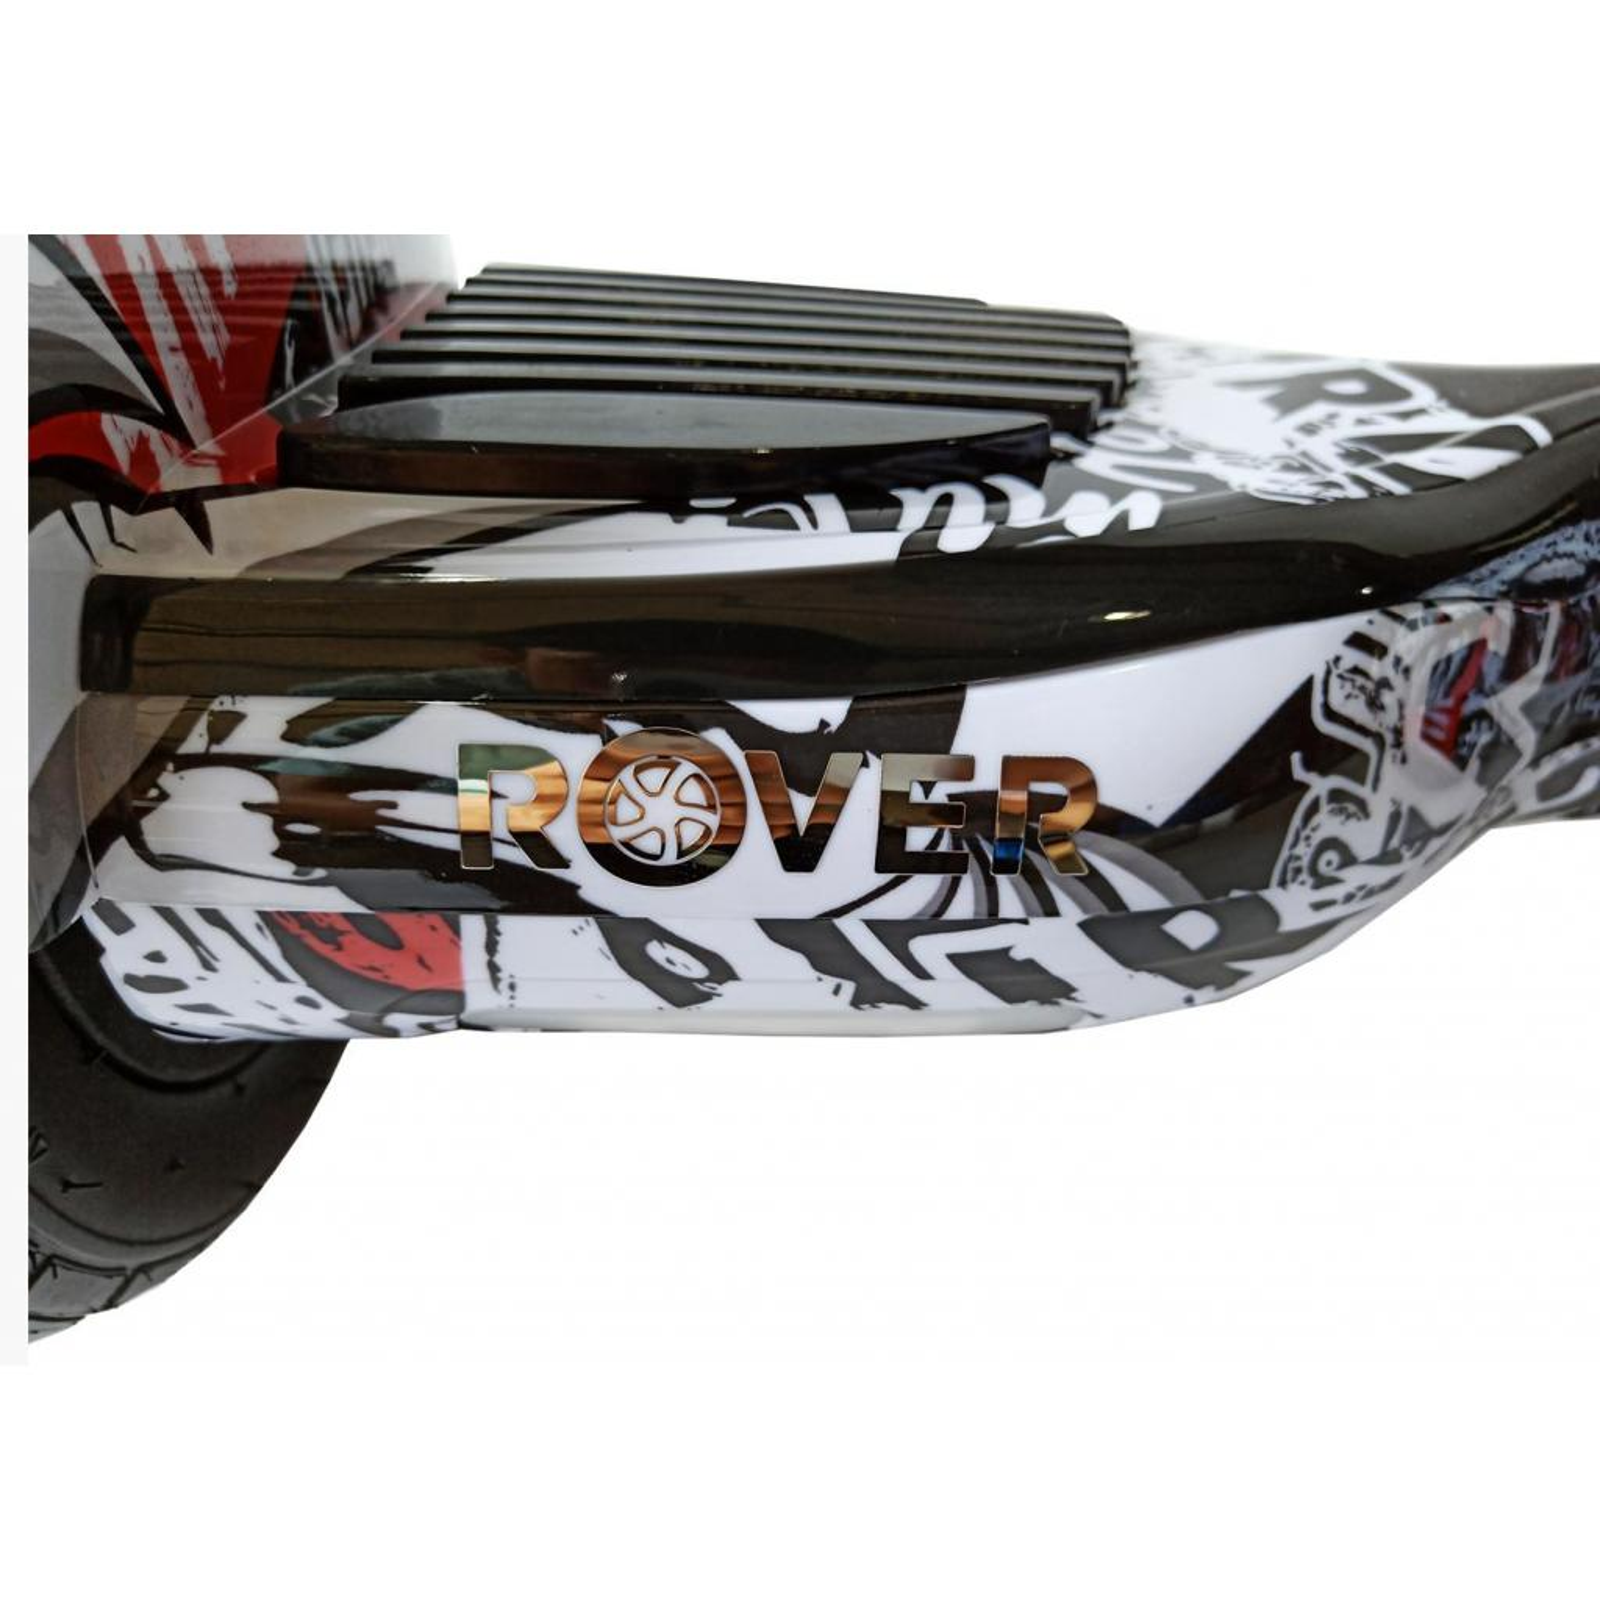 Гироборд Rover XL6 10.5 Grafitti white-red изображение 6